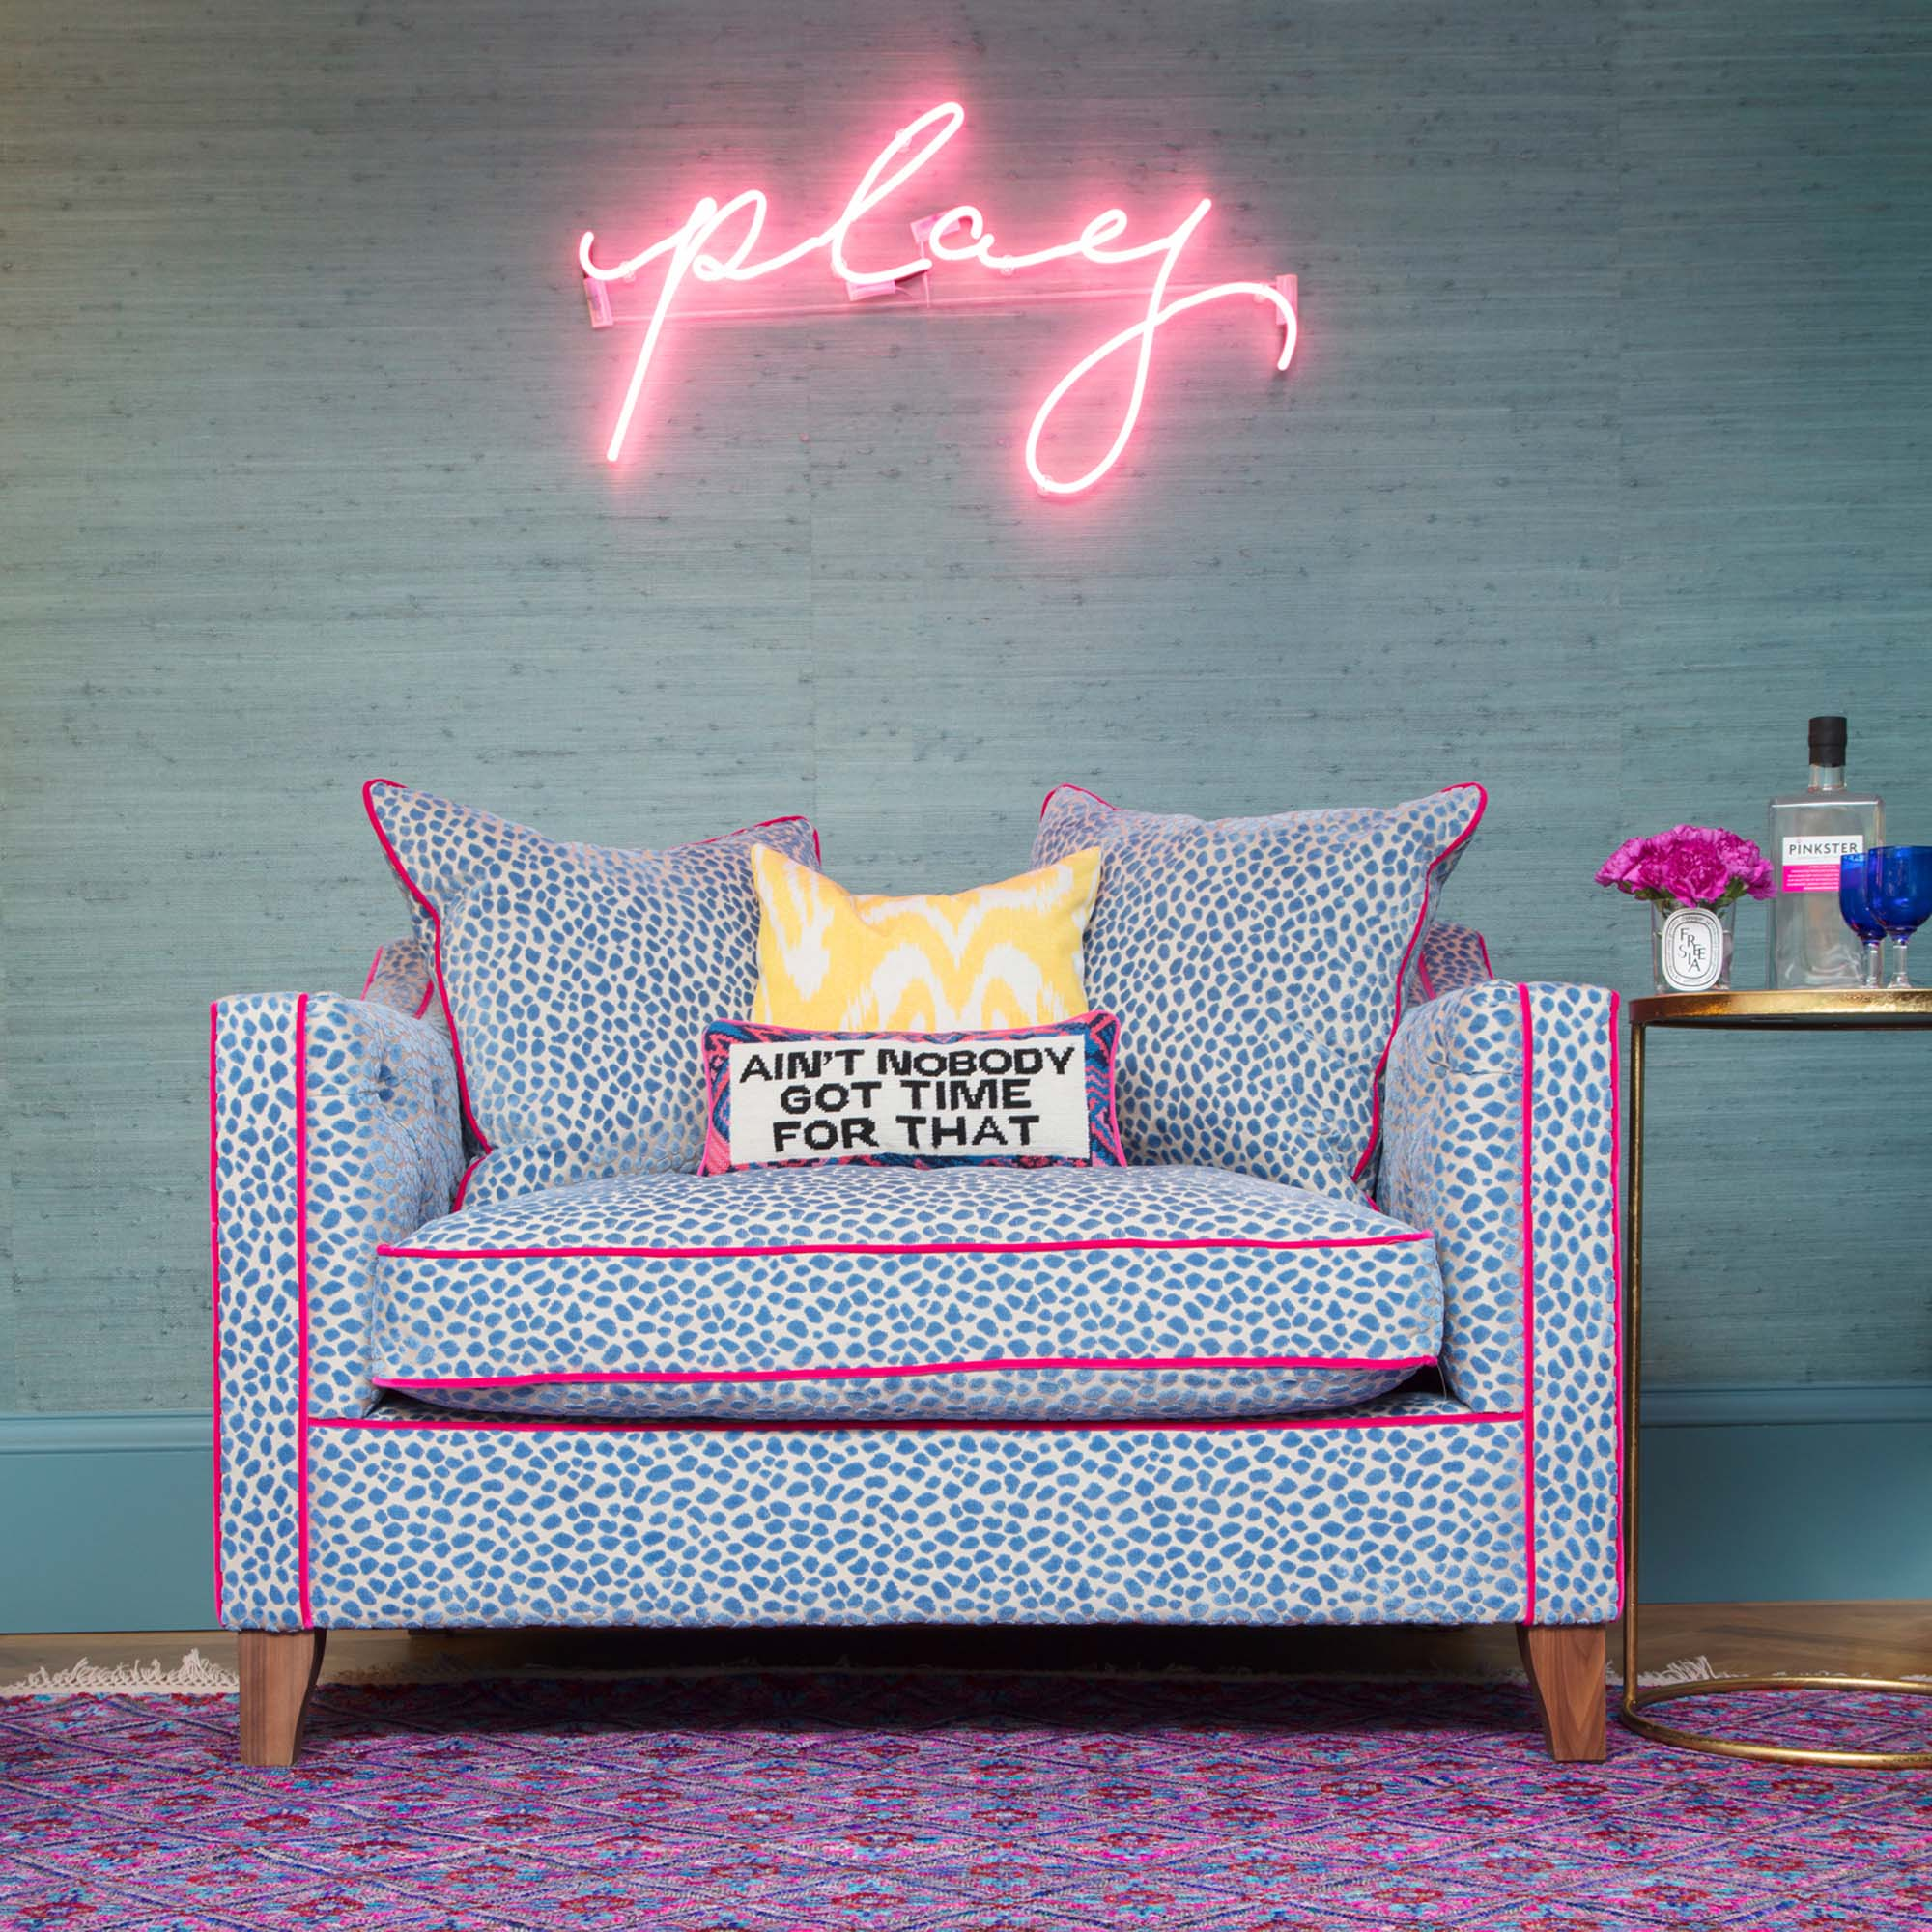 I gotta whole lotta time for my Sofas & Stuff snuggler/Photo: Susie Lowe